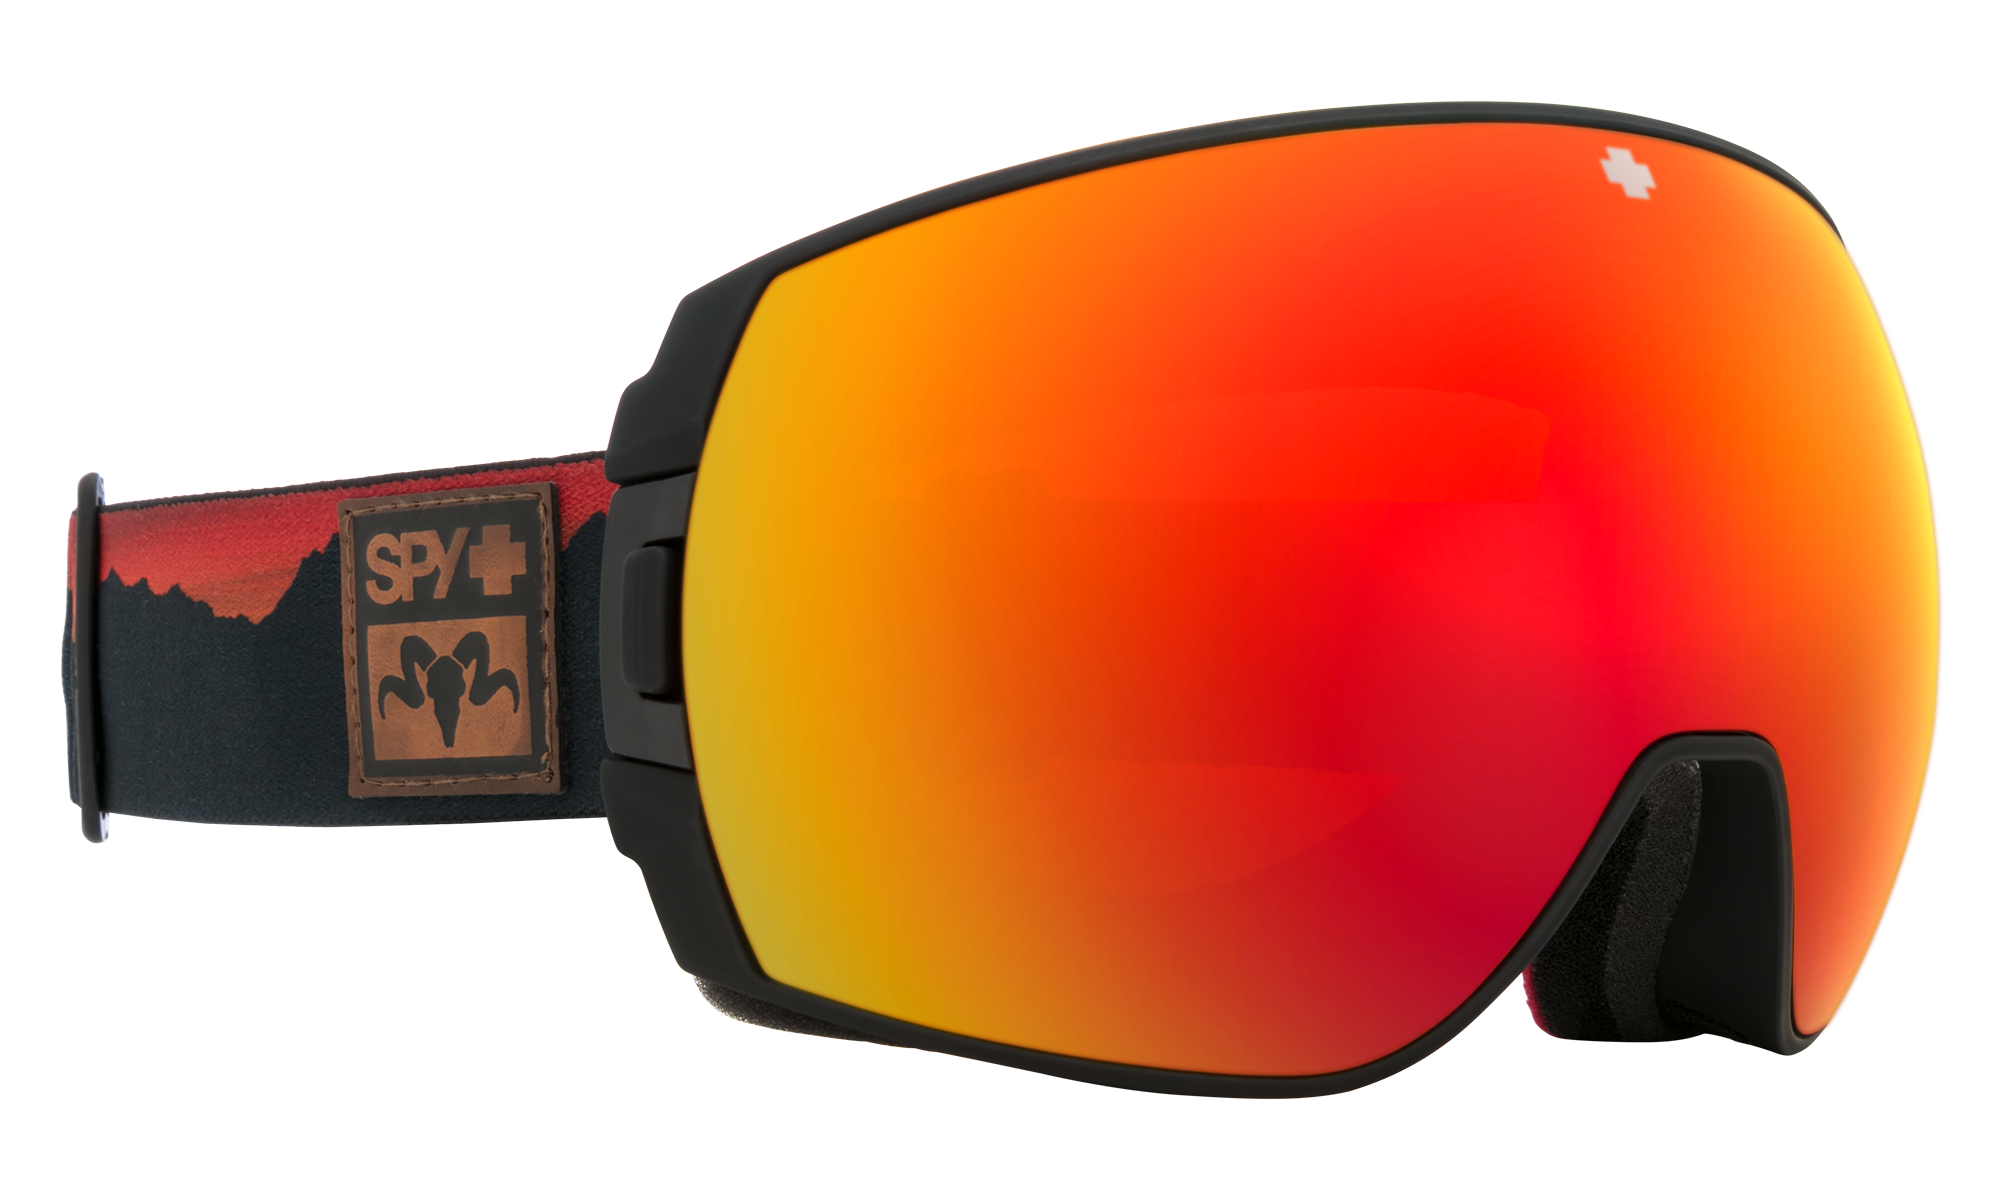 2021 Spy Legacy Snow Goggles